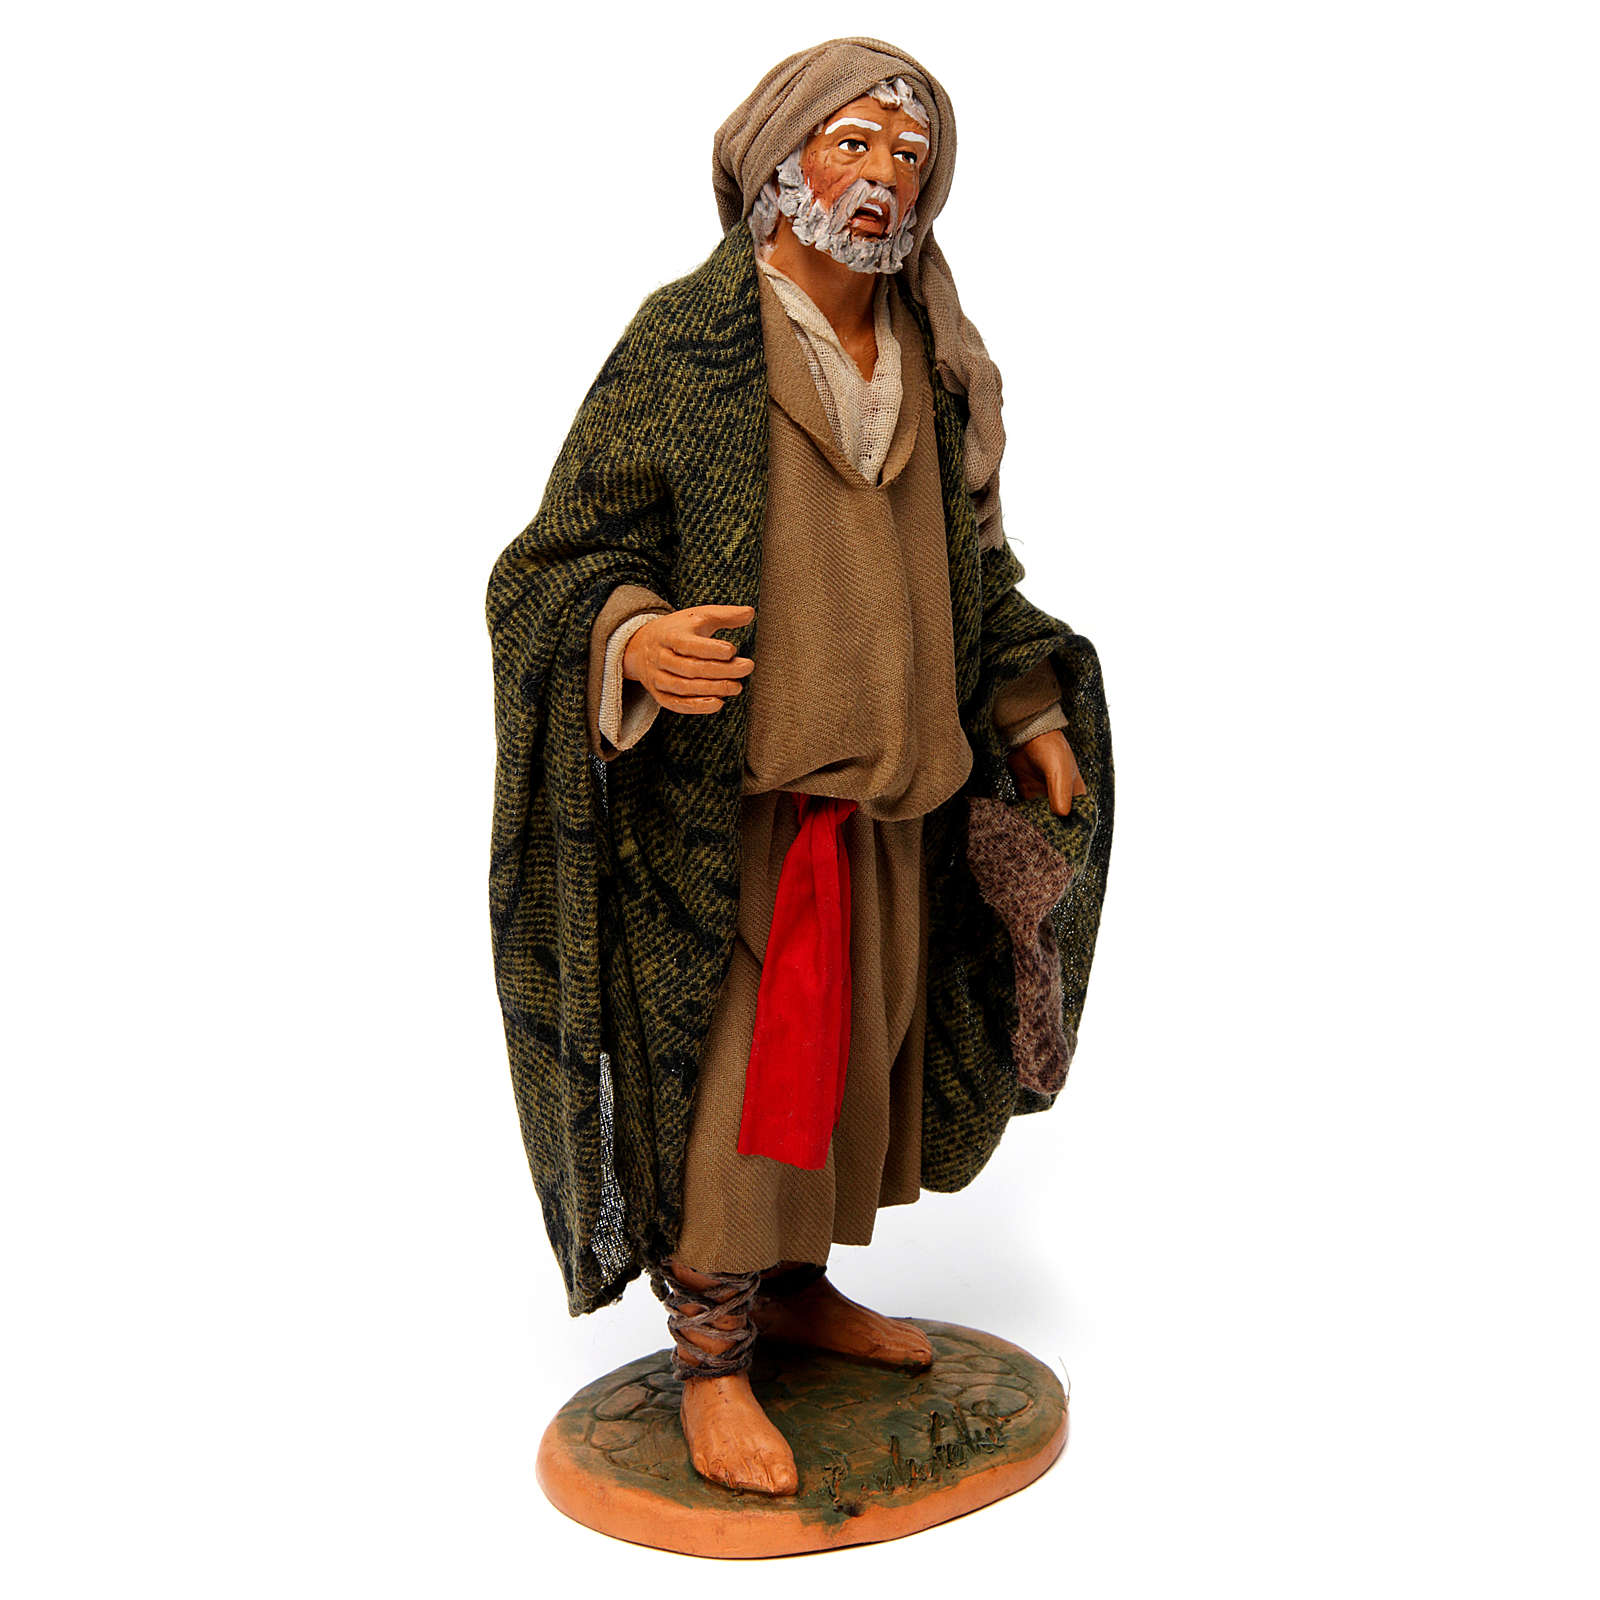 Hombre anciano con capa para belén napolitano 30 cm de altura media 4